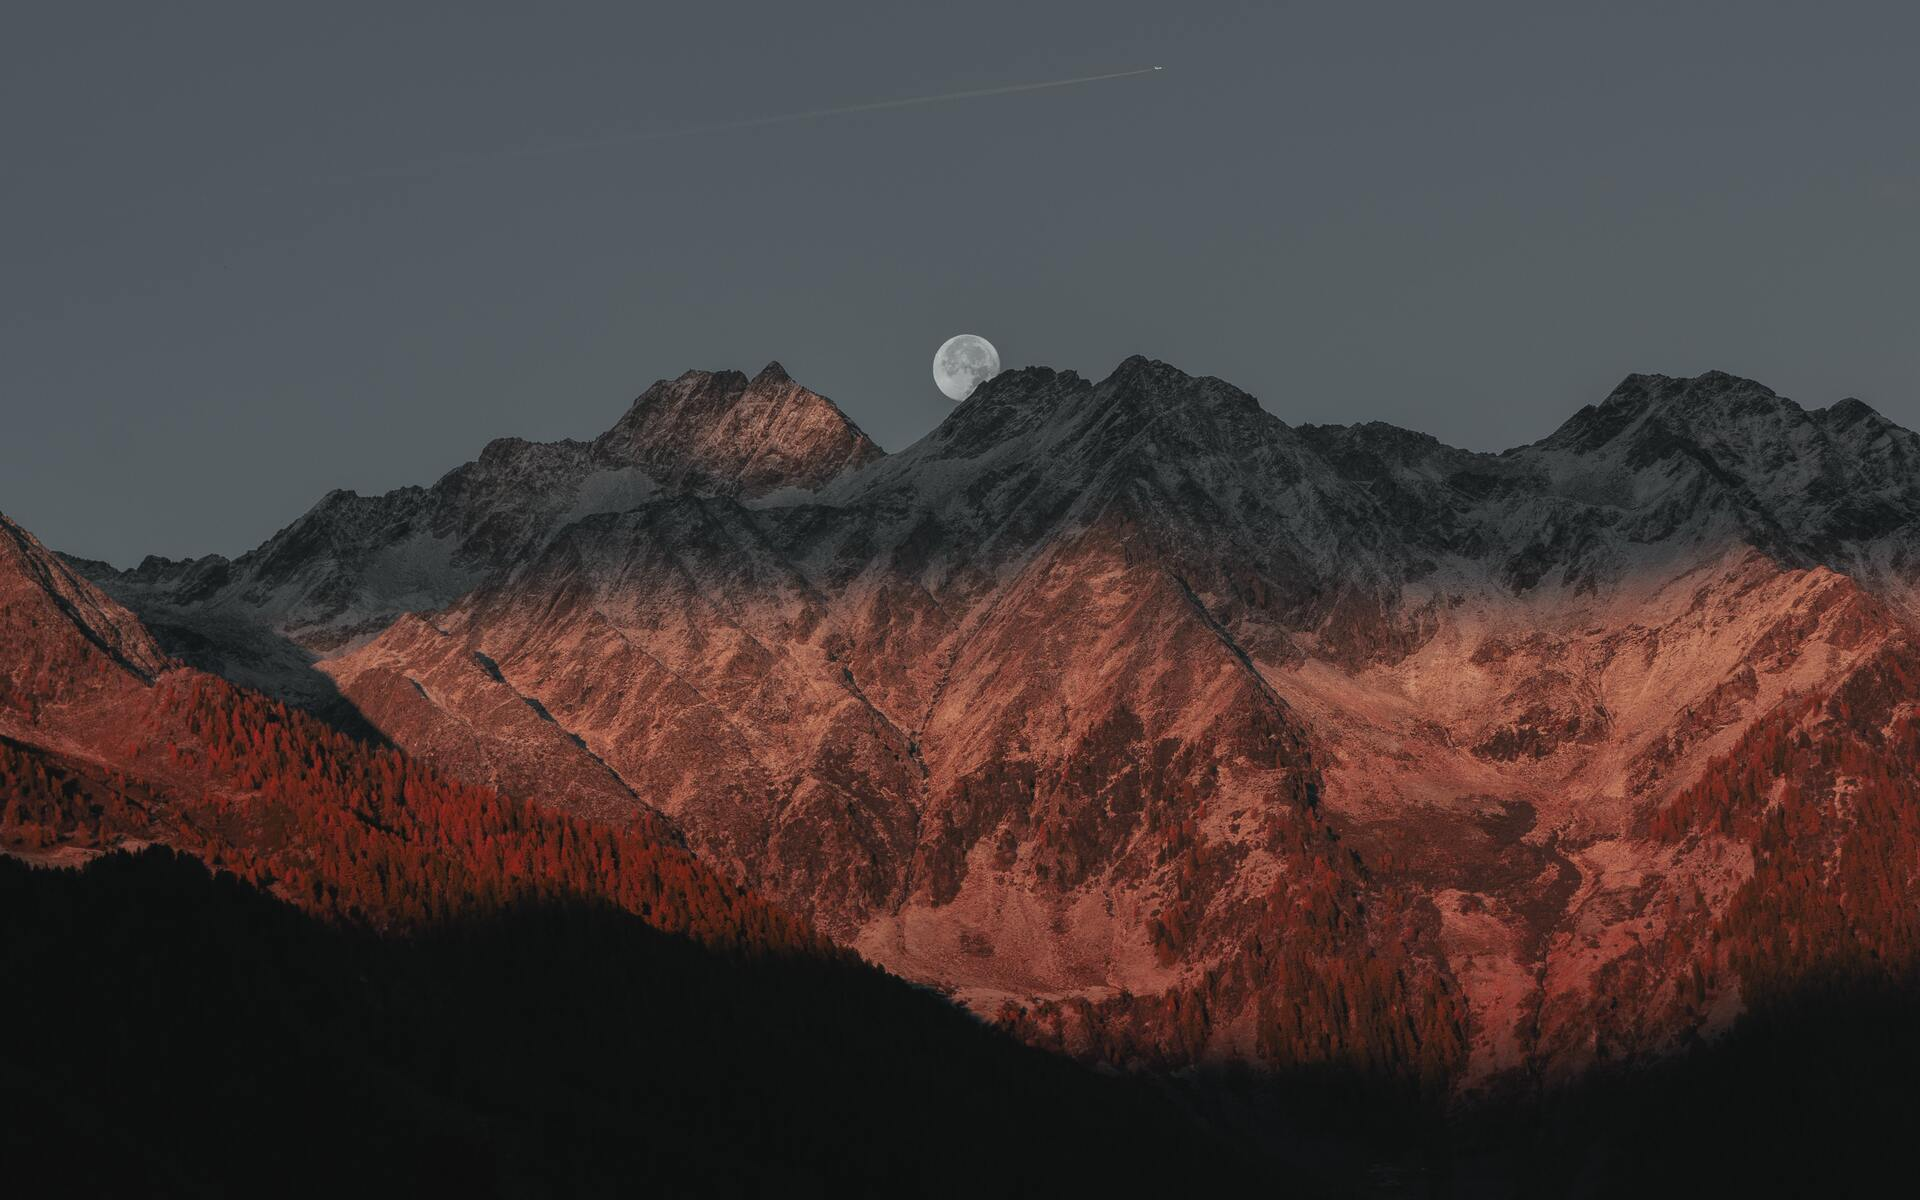 1920x1200 Full Moon Behind Mountain Dark Evening Late Sunset 5k